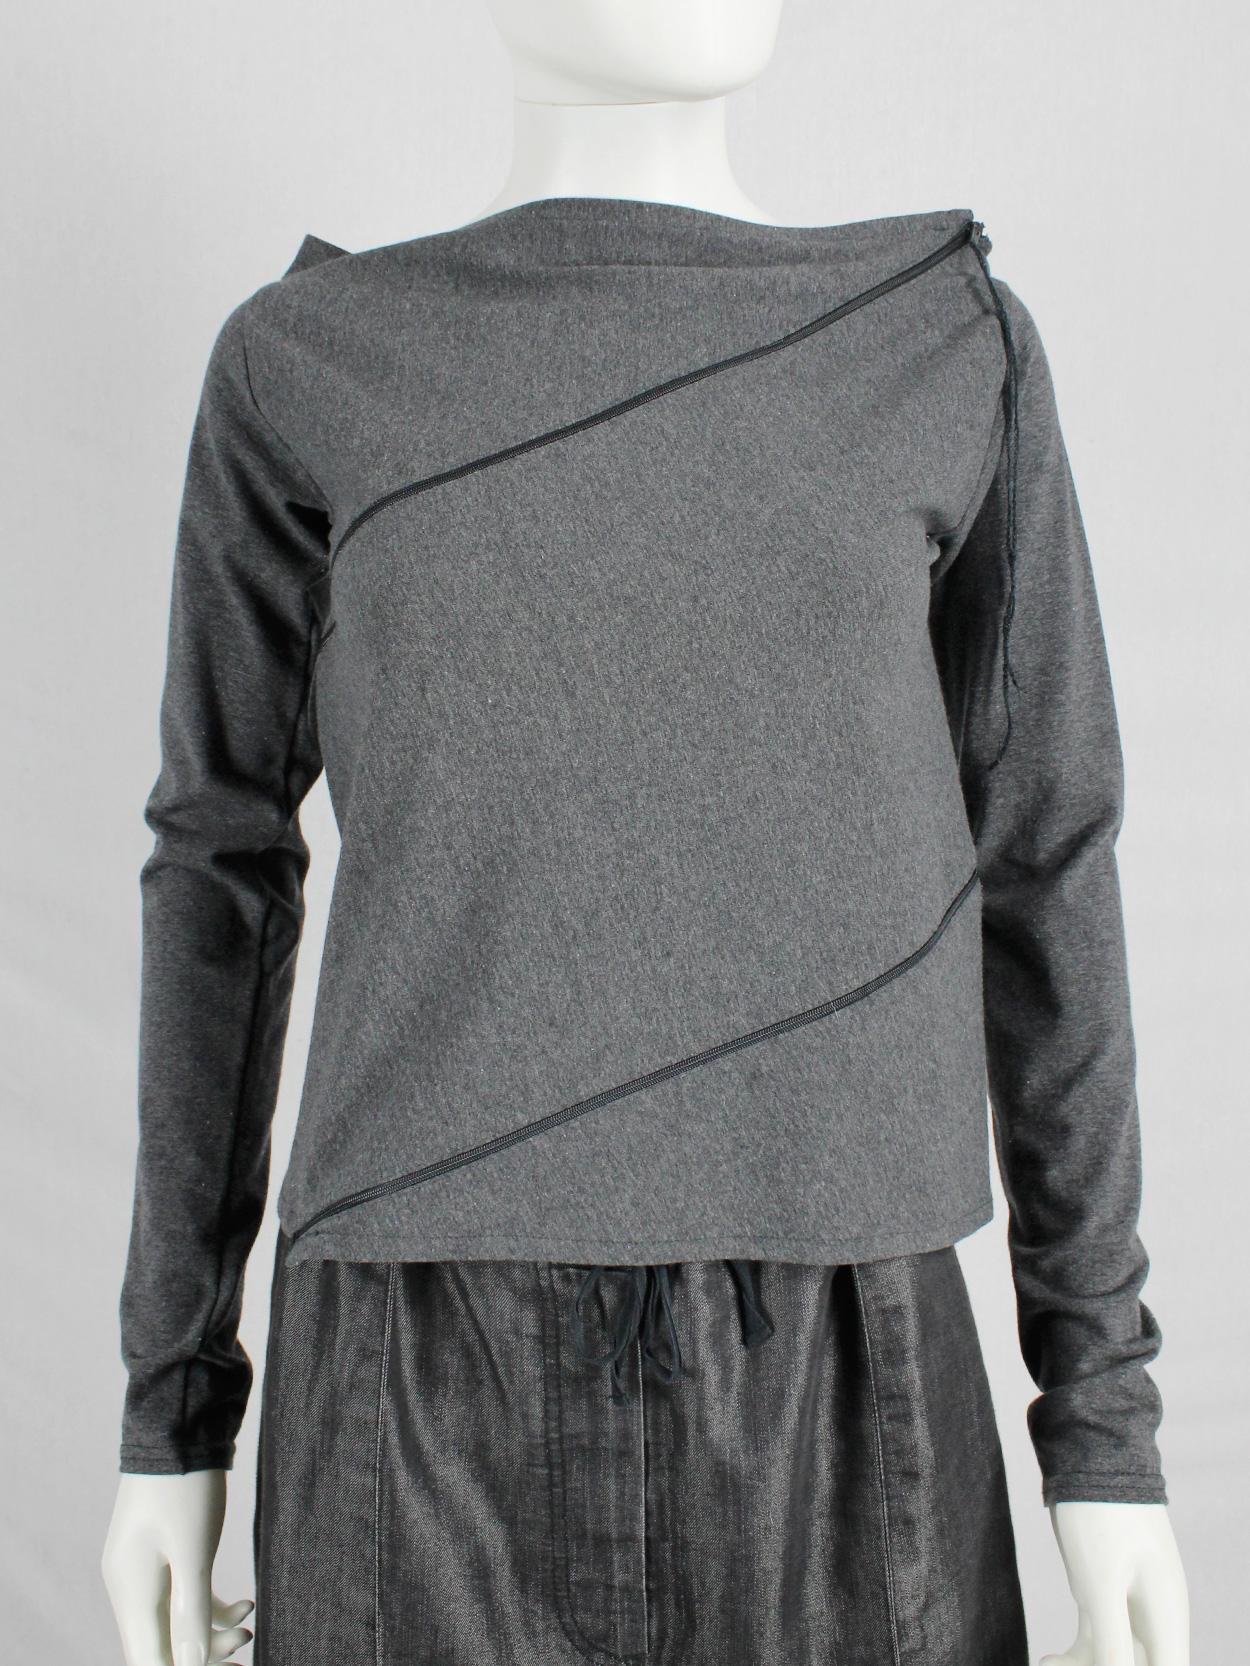 Maison Martin Margiela zipper sweater VINTAGE!!